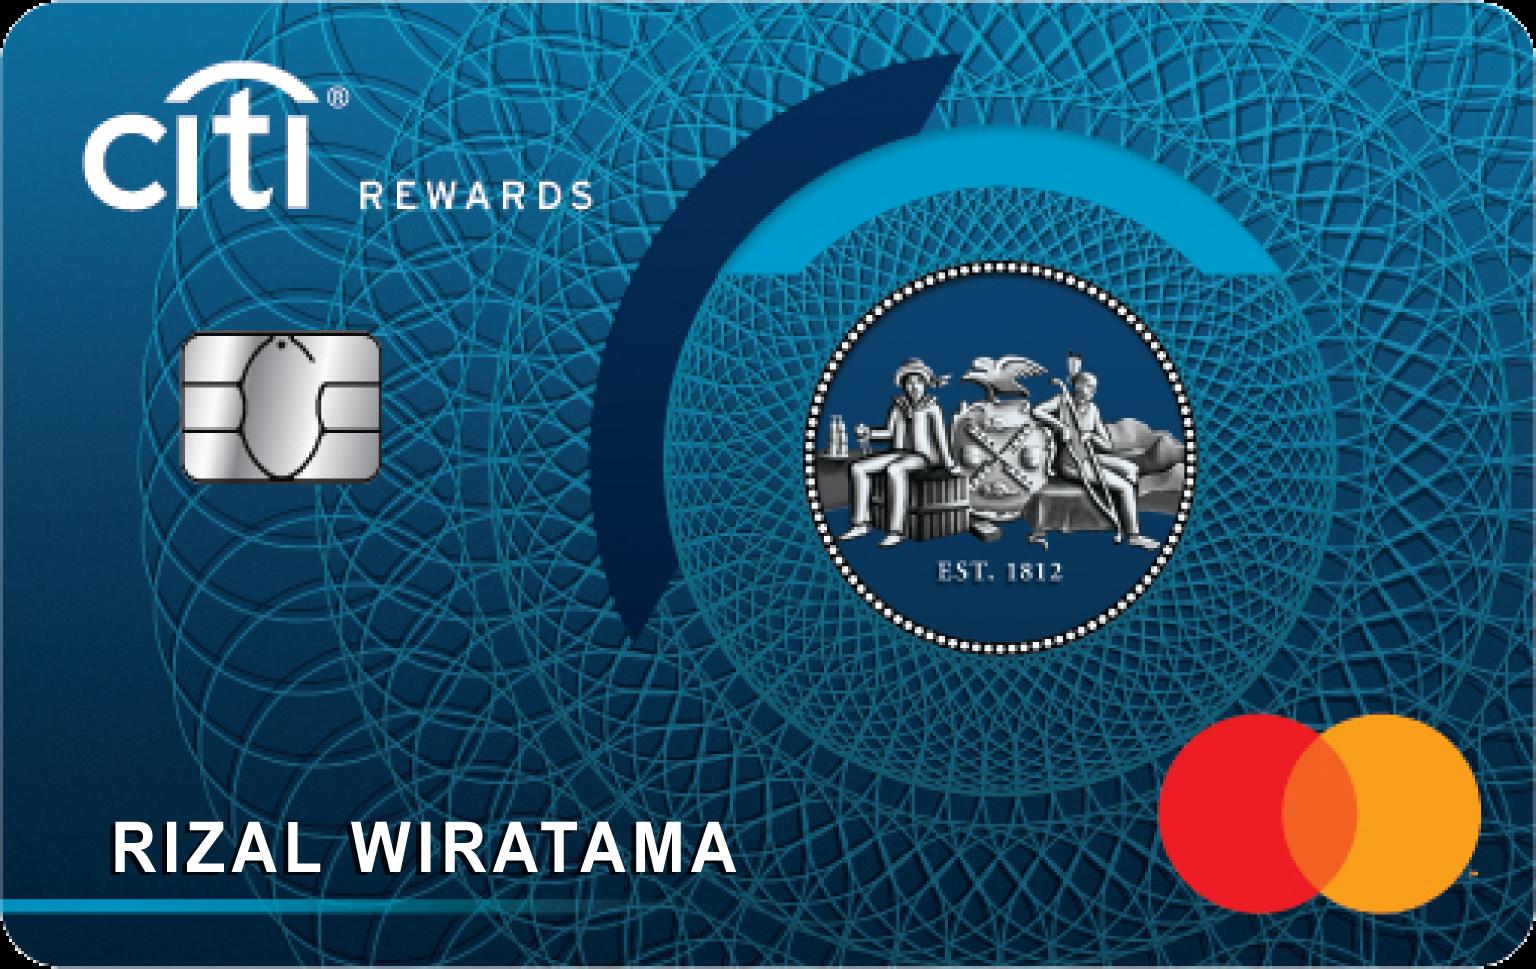 Kartu Kredit Citibank Kartu Kredit Citi Rewards Tokopedia